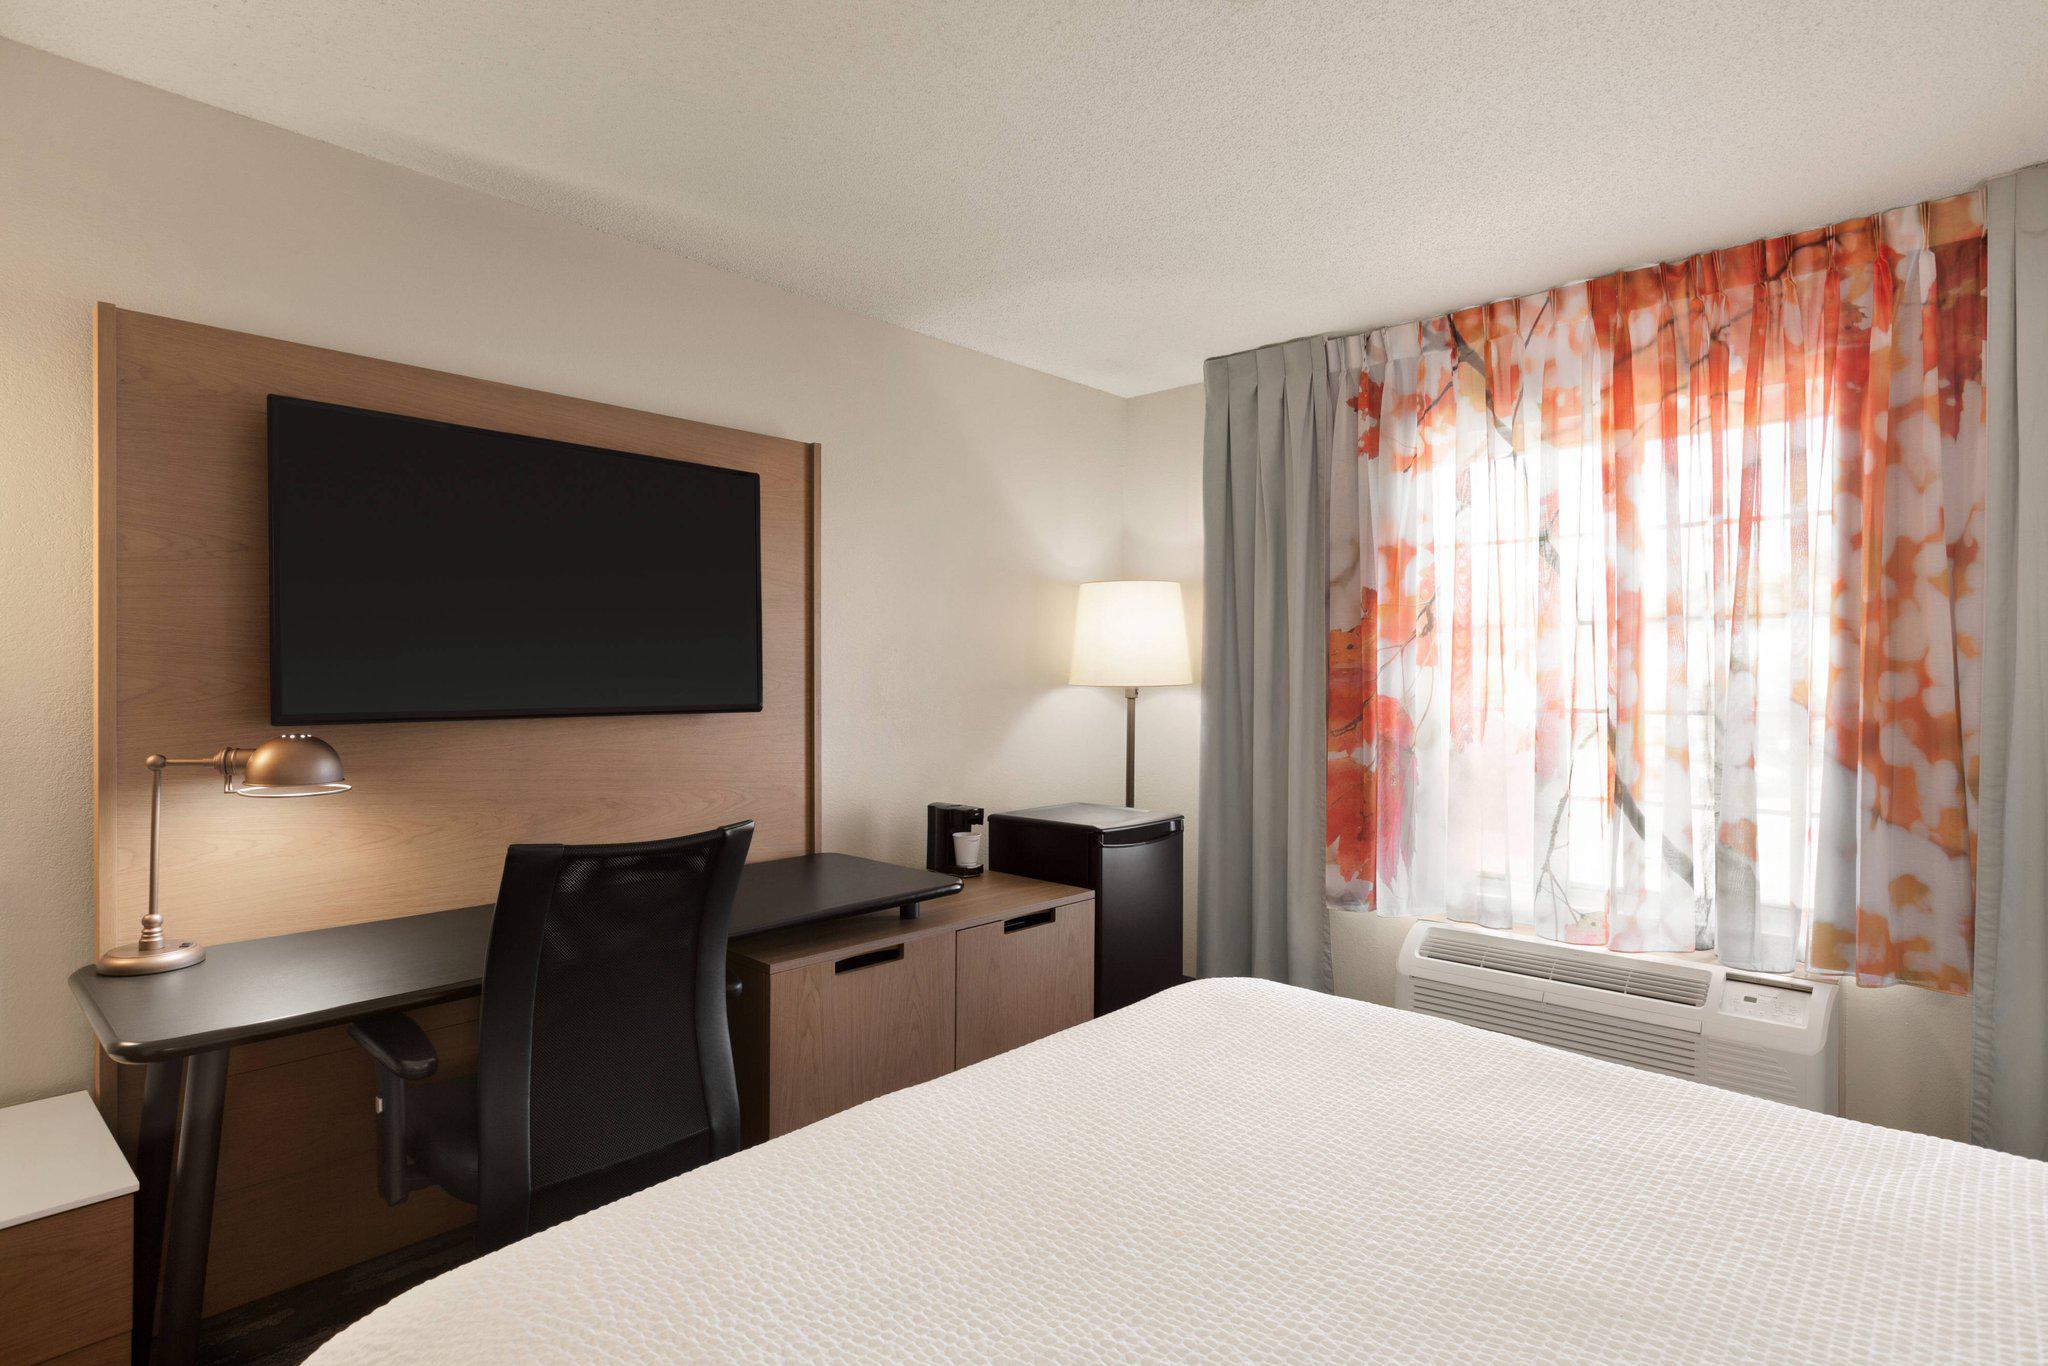 Fairfield Inn & Suites by Marriott Wheeling-St. Clairsville, OH